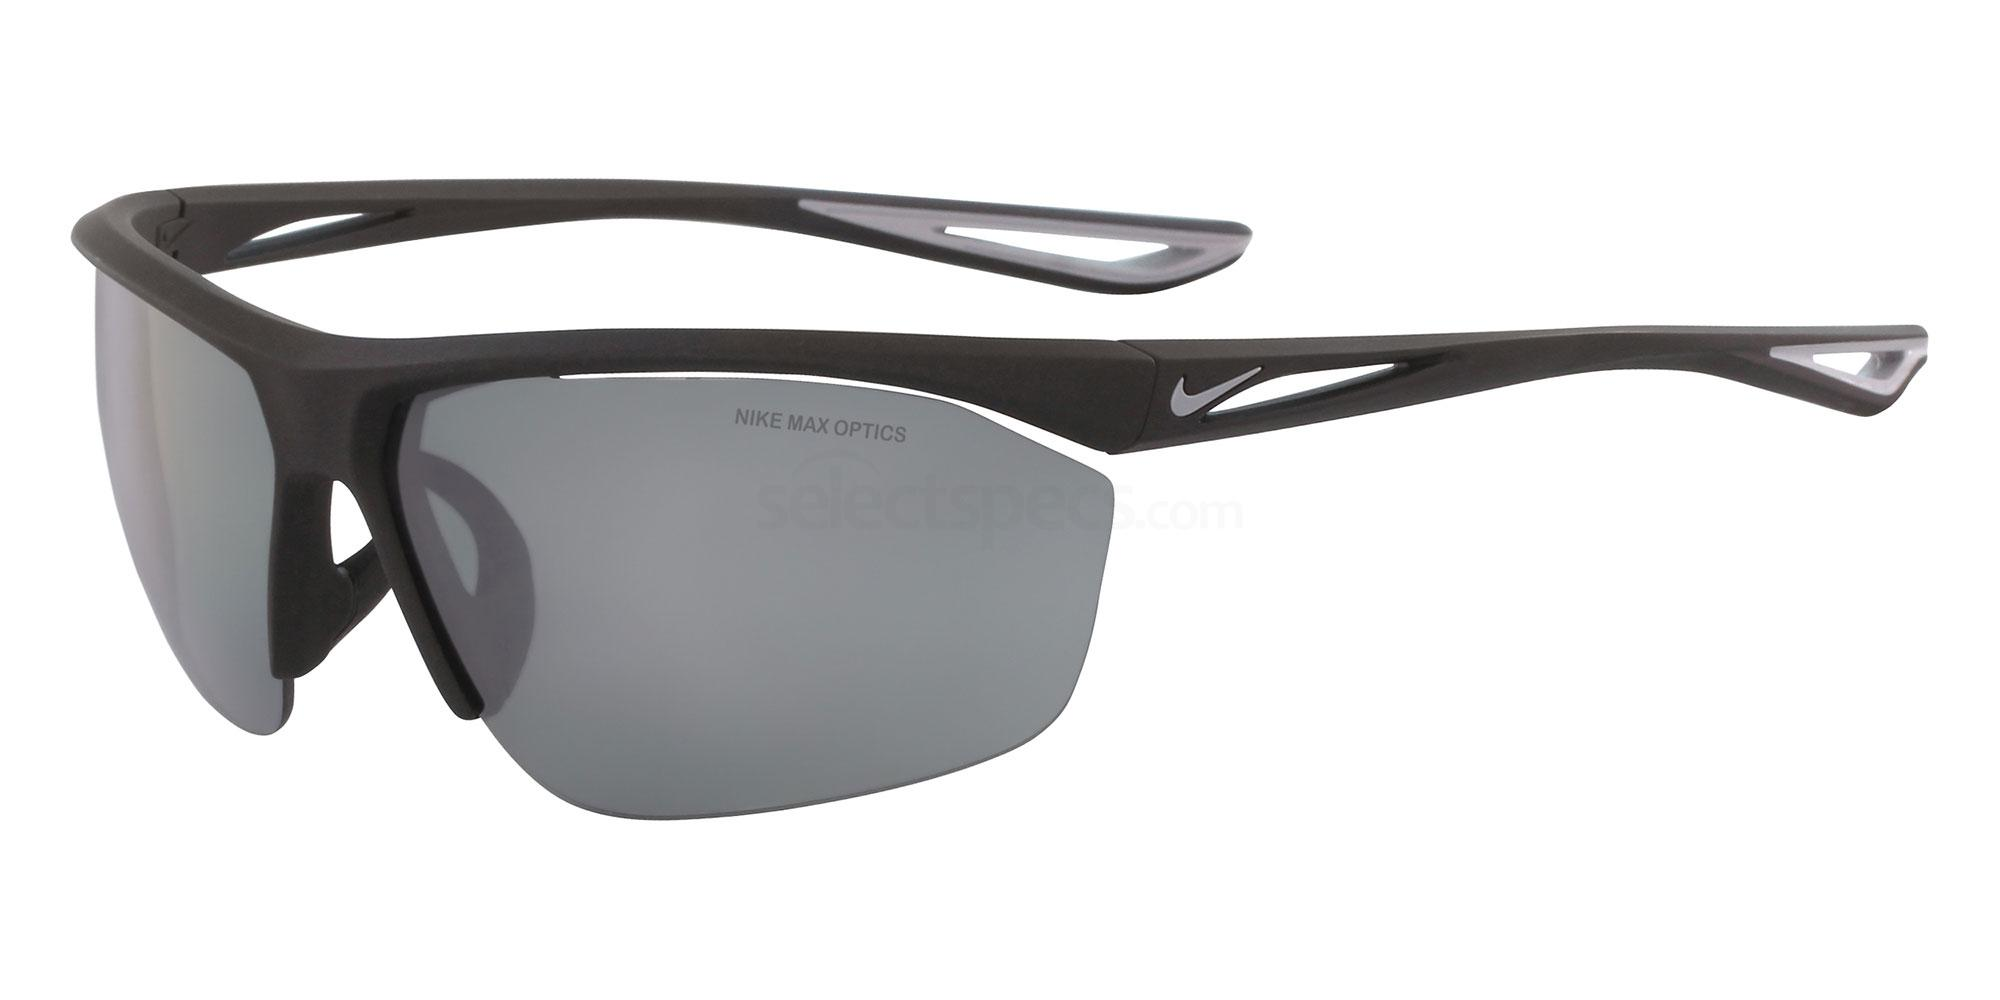 001 TAILWIND S EV1106 Sunglasses, Nike